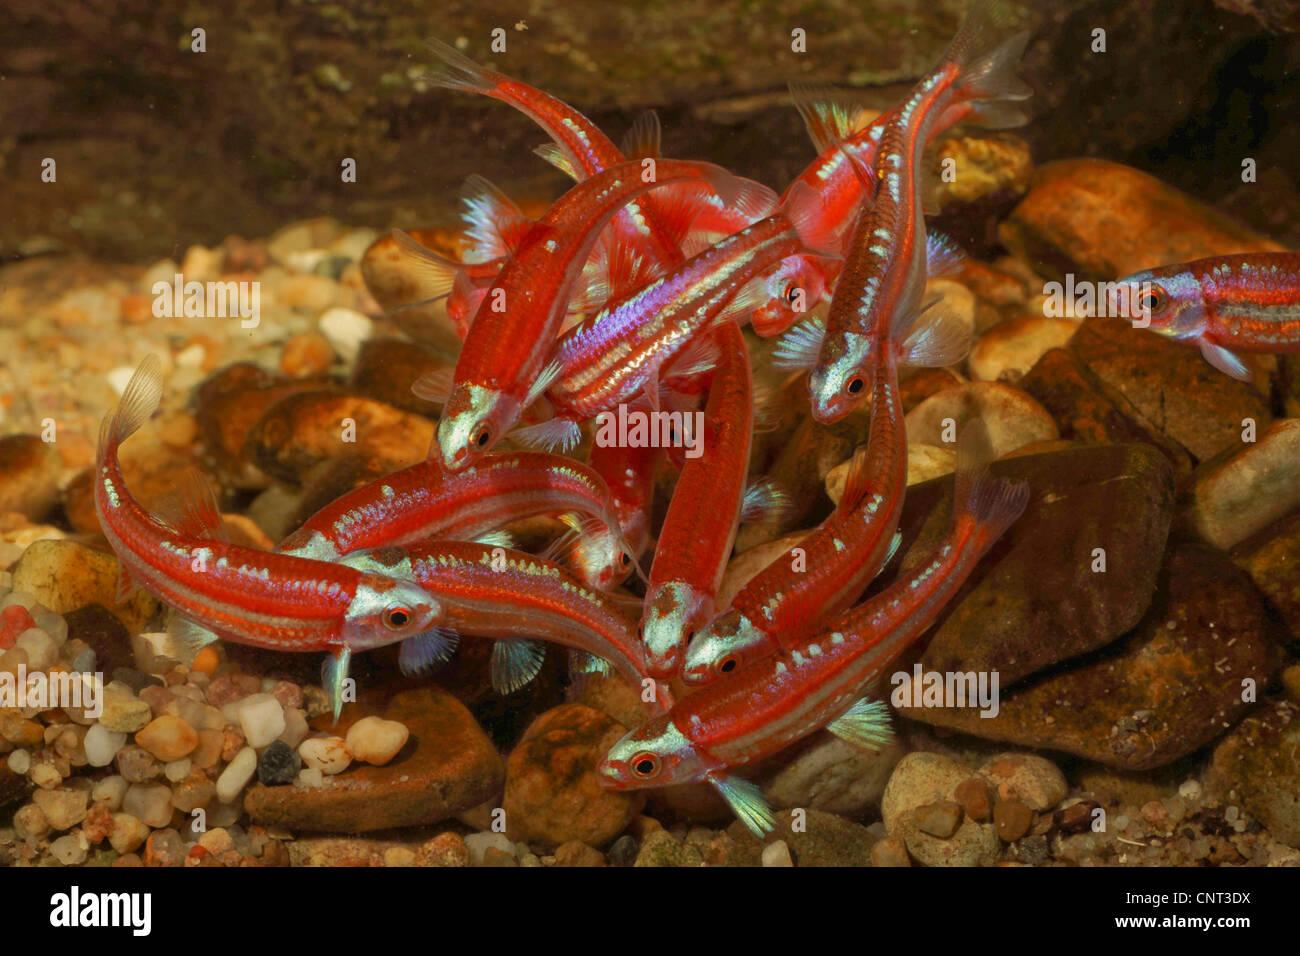 Rainbow shiner (Notropis chrosomus), school of fish spawning - Stock Image